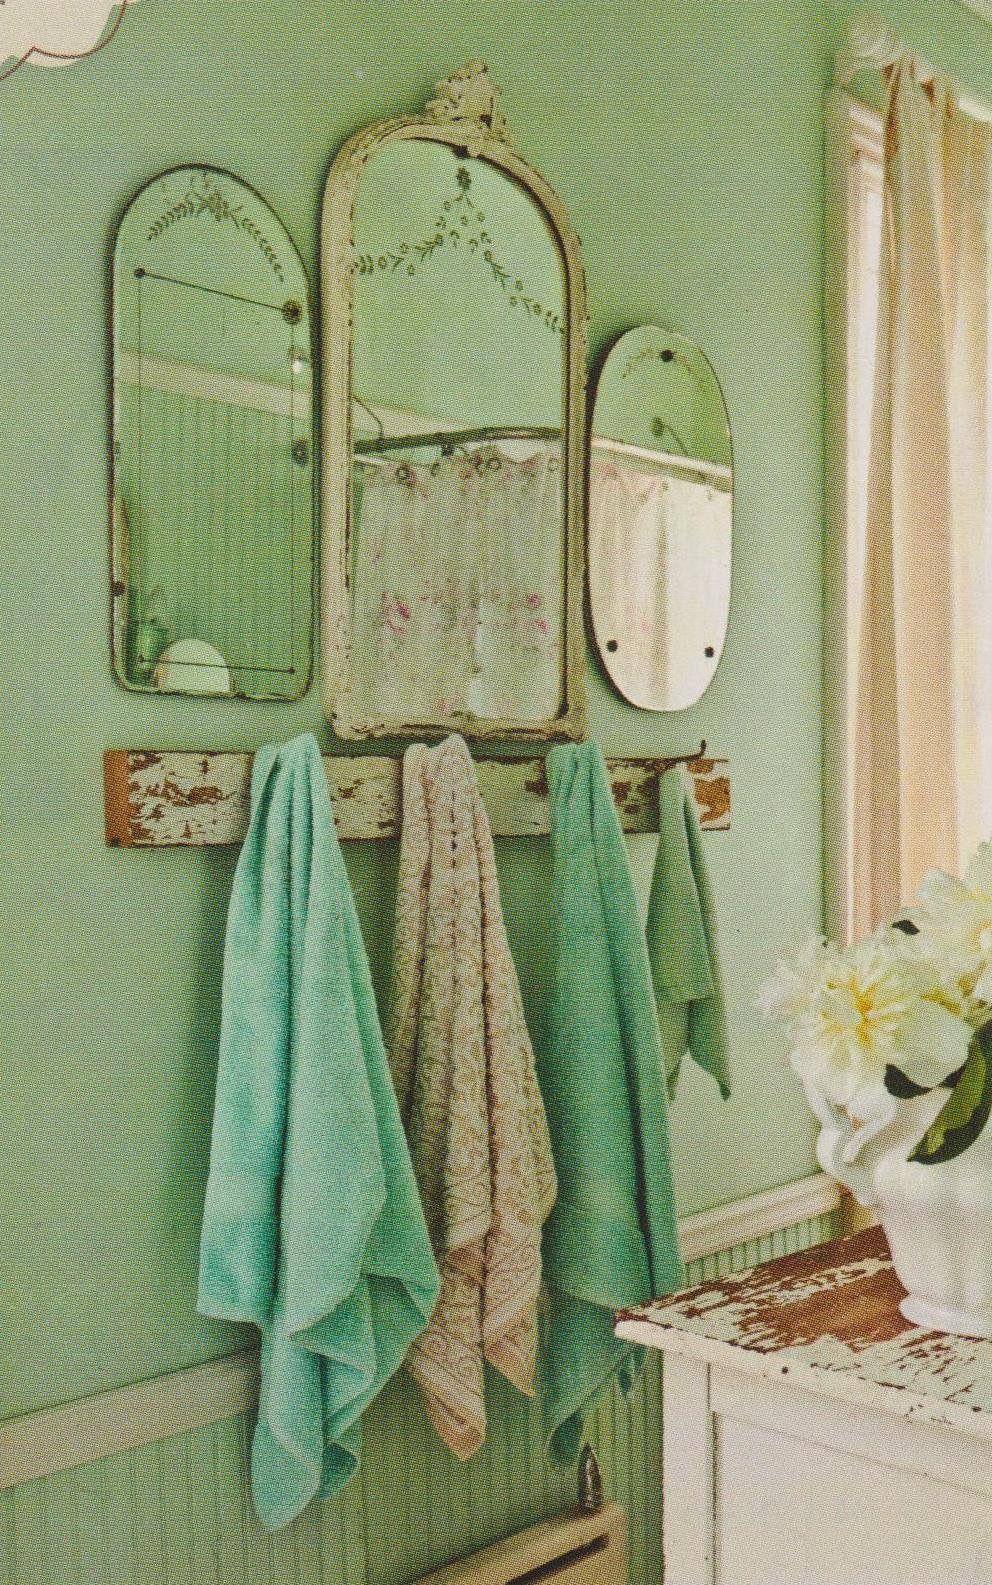 Hall Bath Idea W Mirrors Vintage Bathroom Decor Shabby Chic Bathroom Chic Bathrooms